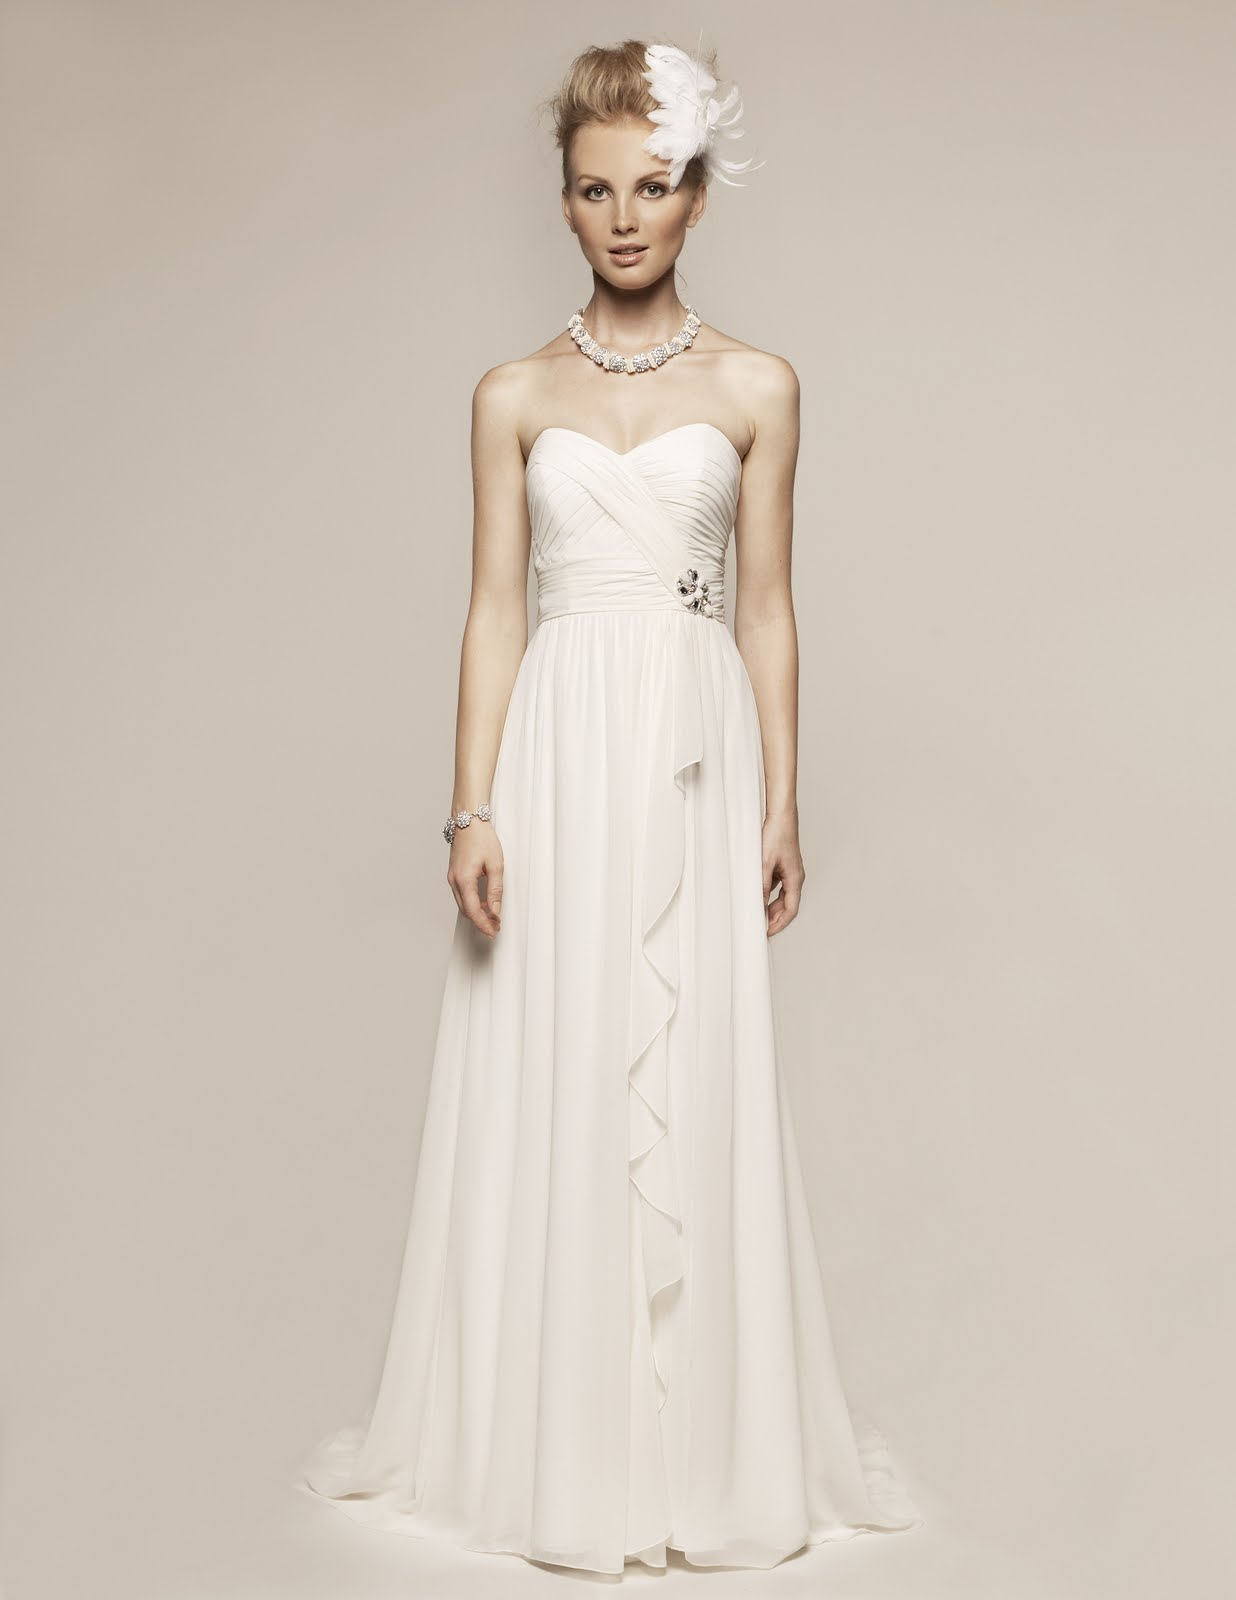 Destination Weddings Bridal Designer fers New Options